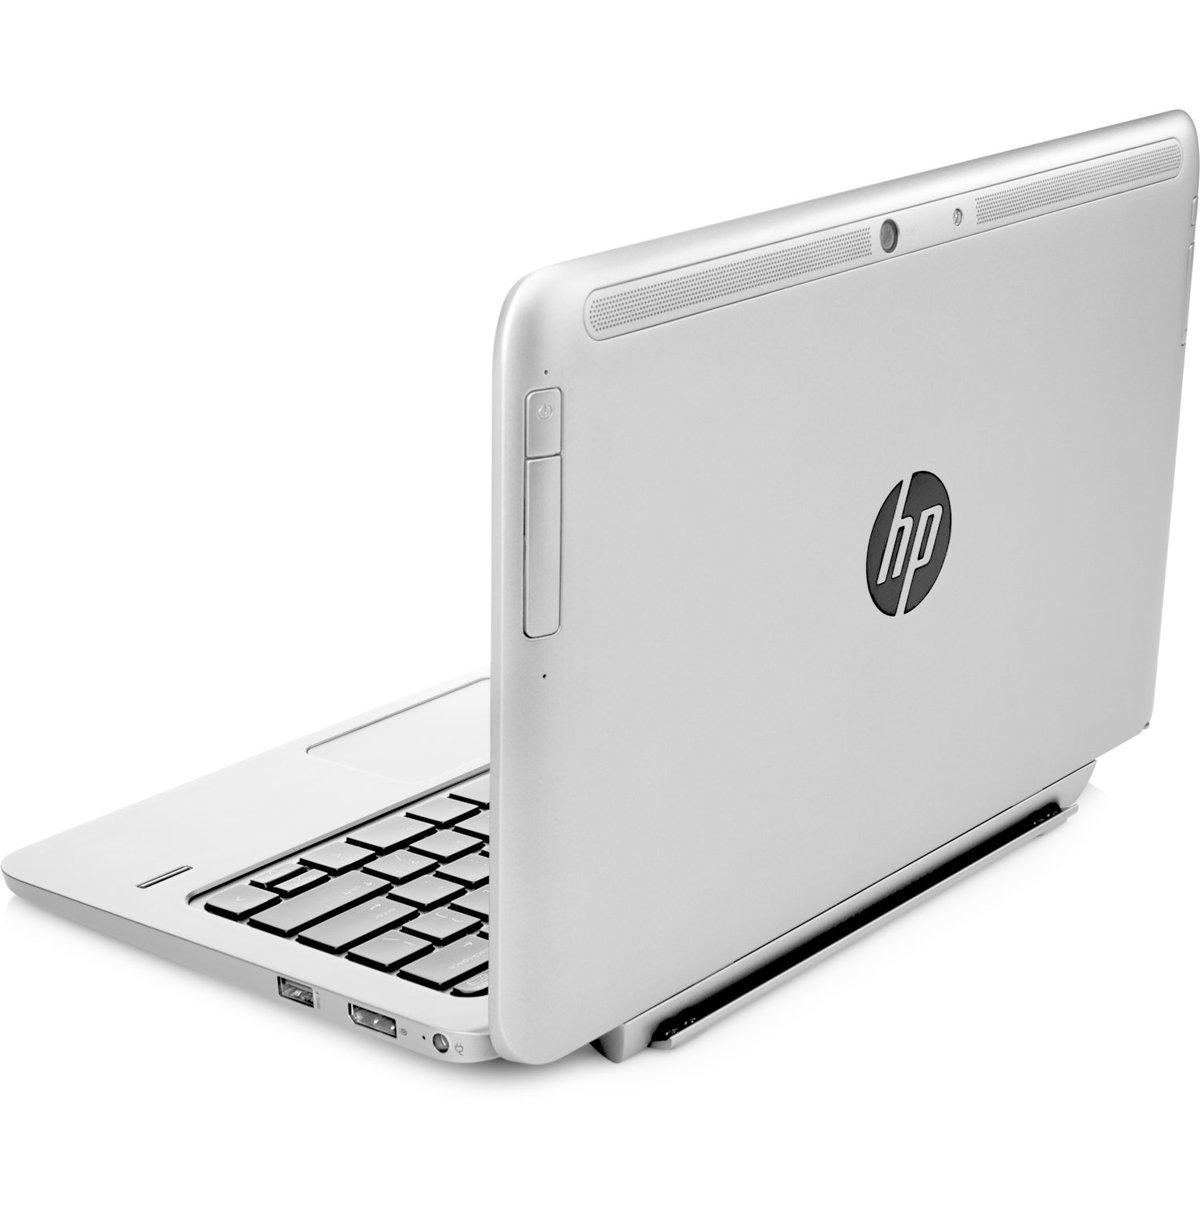 Hp Elite X2 1011 G1 116 Touchscreen Lcd 2 In 1 Ultrabook Intel Core 1012 Tablet Energy Star M 5y71 Dual 120 Ghz 8 Gb Lpddr3 256 Ssd Windows 81 Pro 64